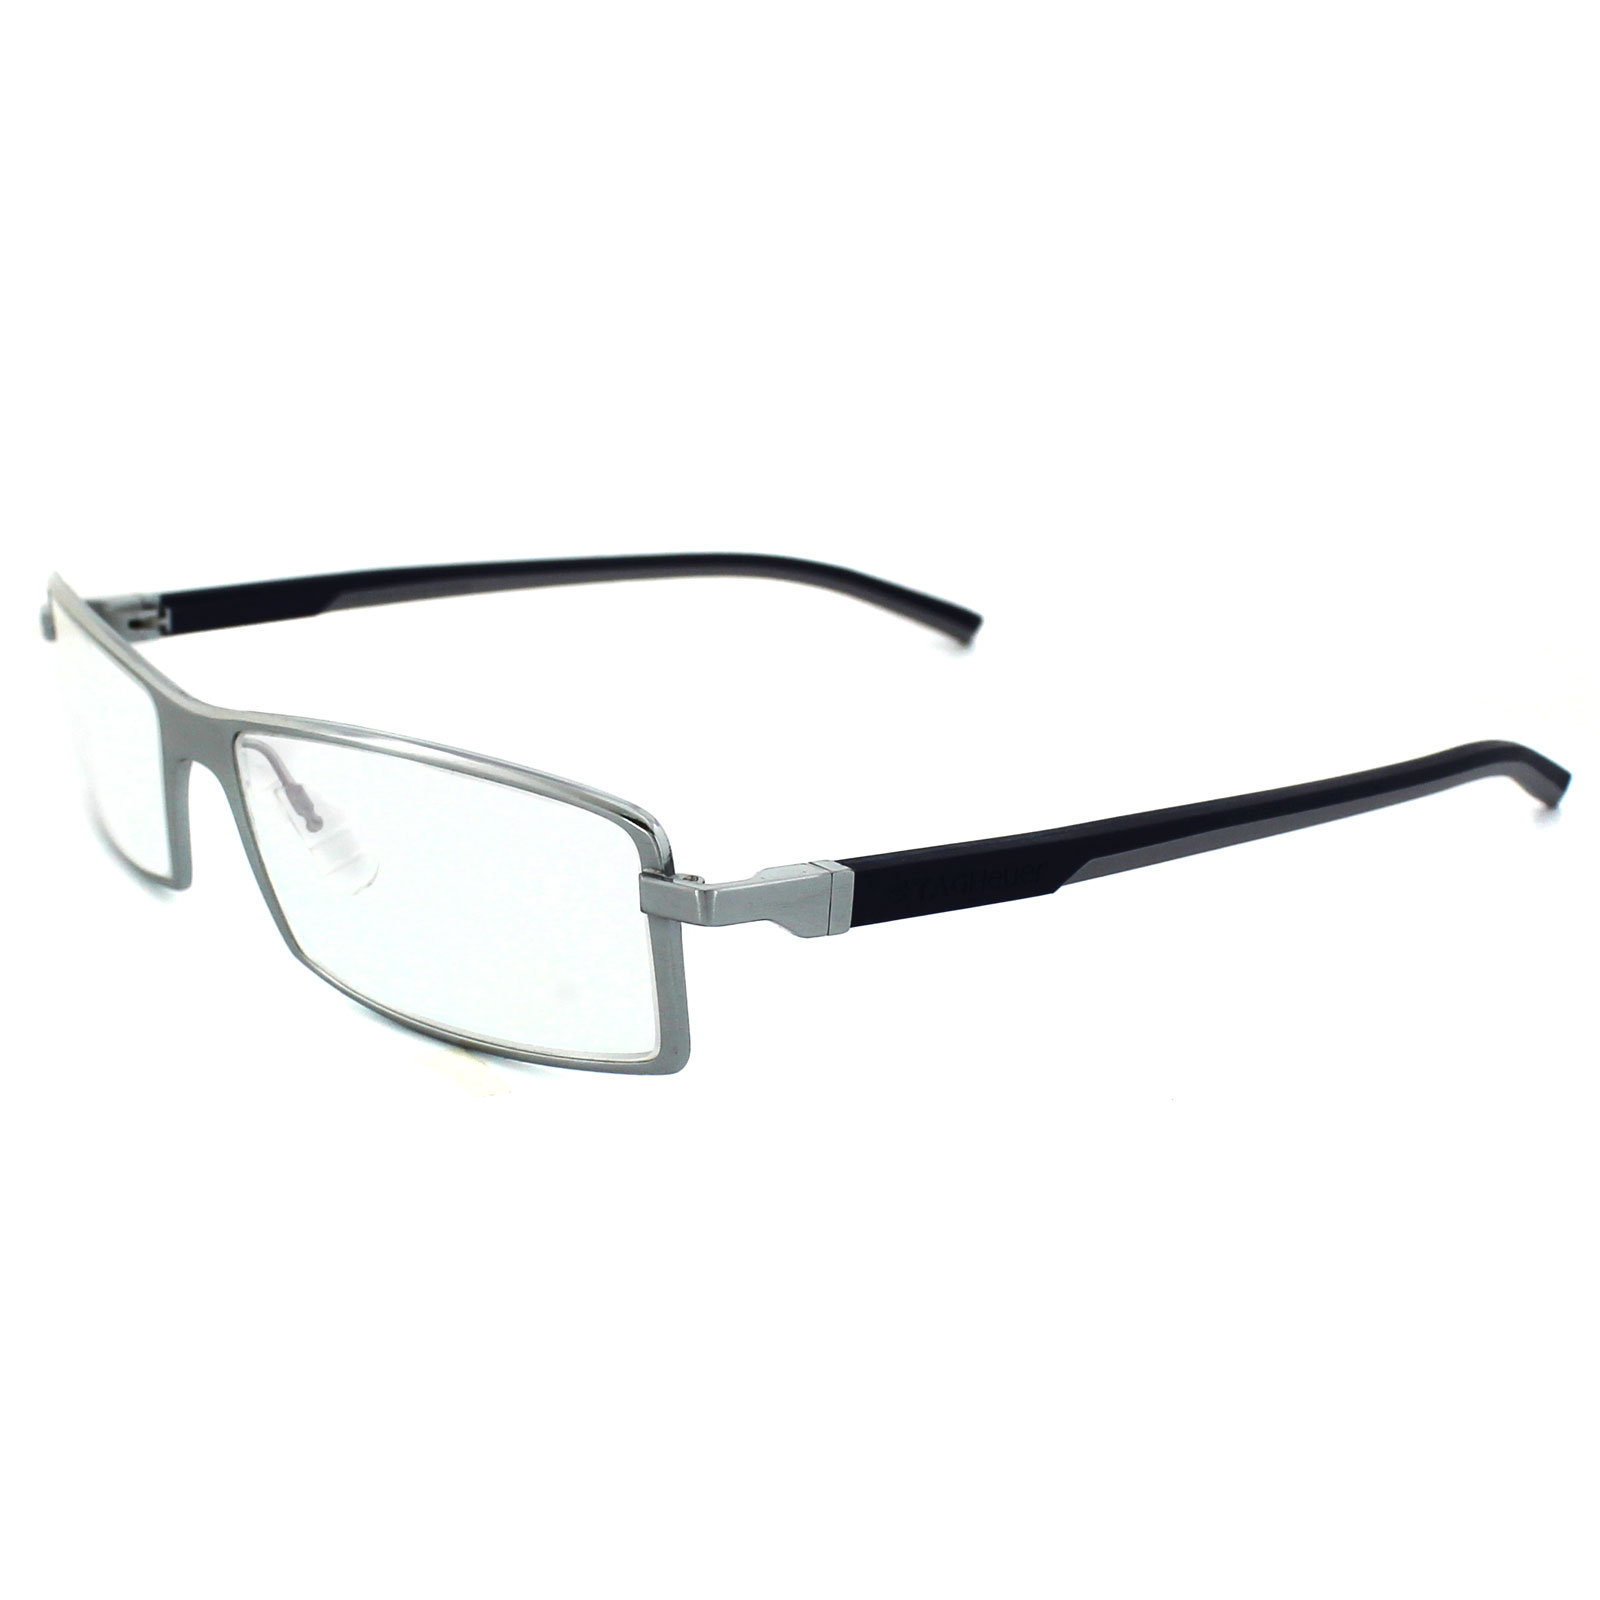 Tag Heuer Glasses Automatic 0802 004 Pure Rahmen Blau & Grau Temples ...